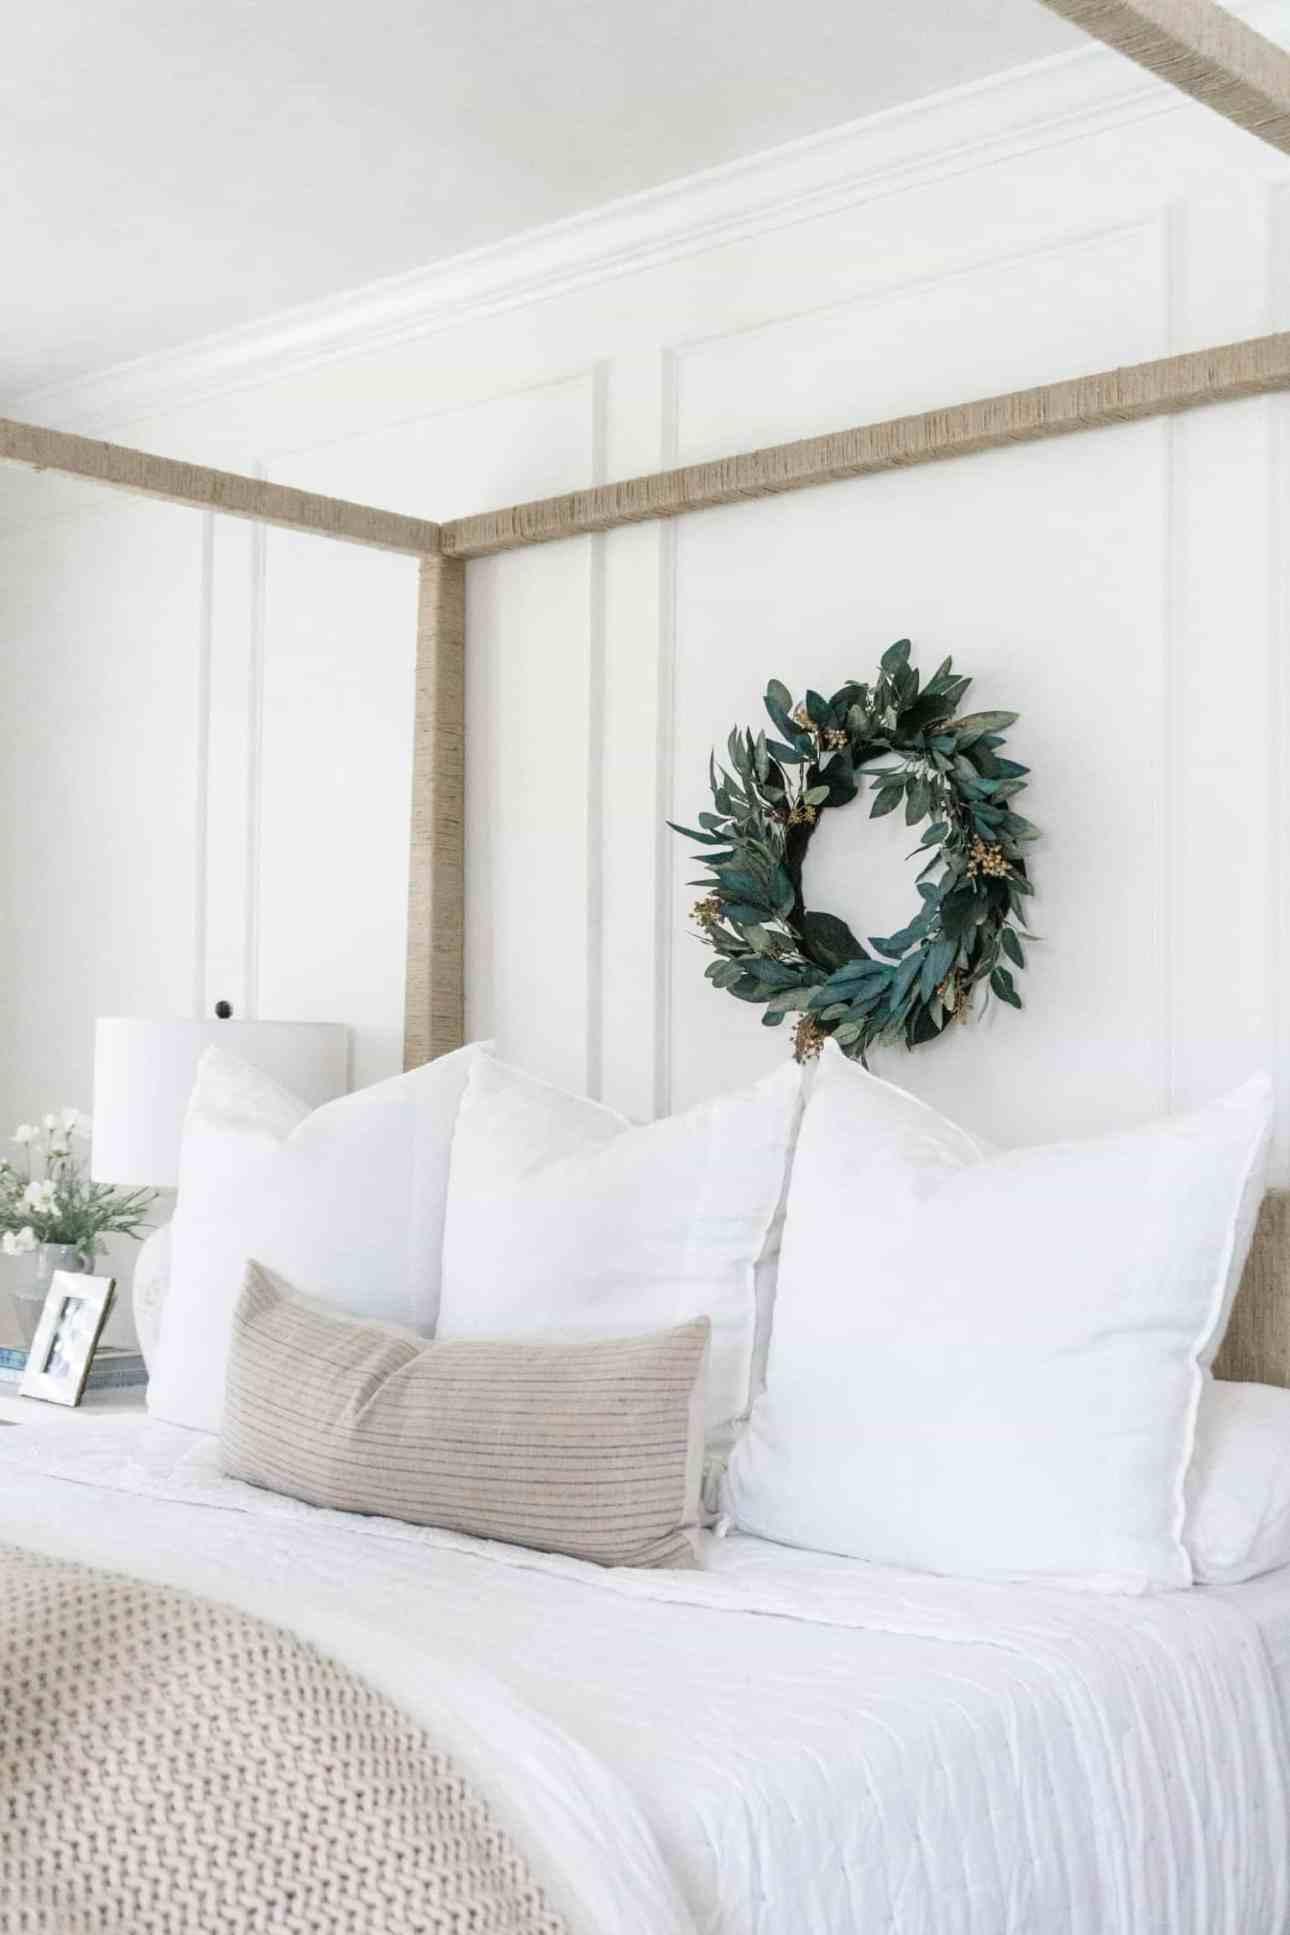 White Sutter quilt and linen bedding.